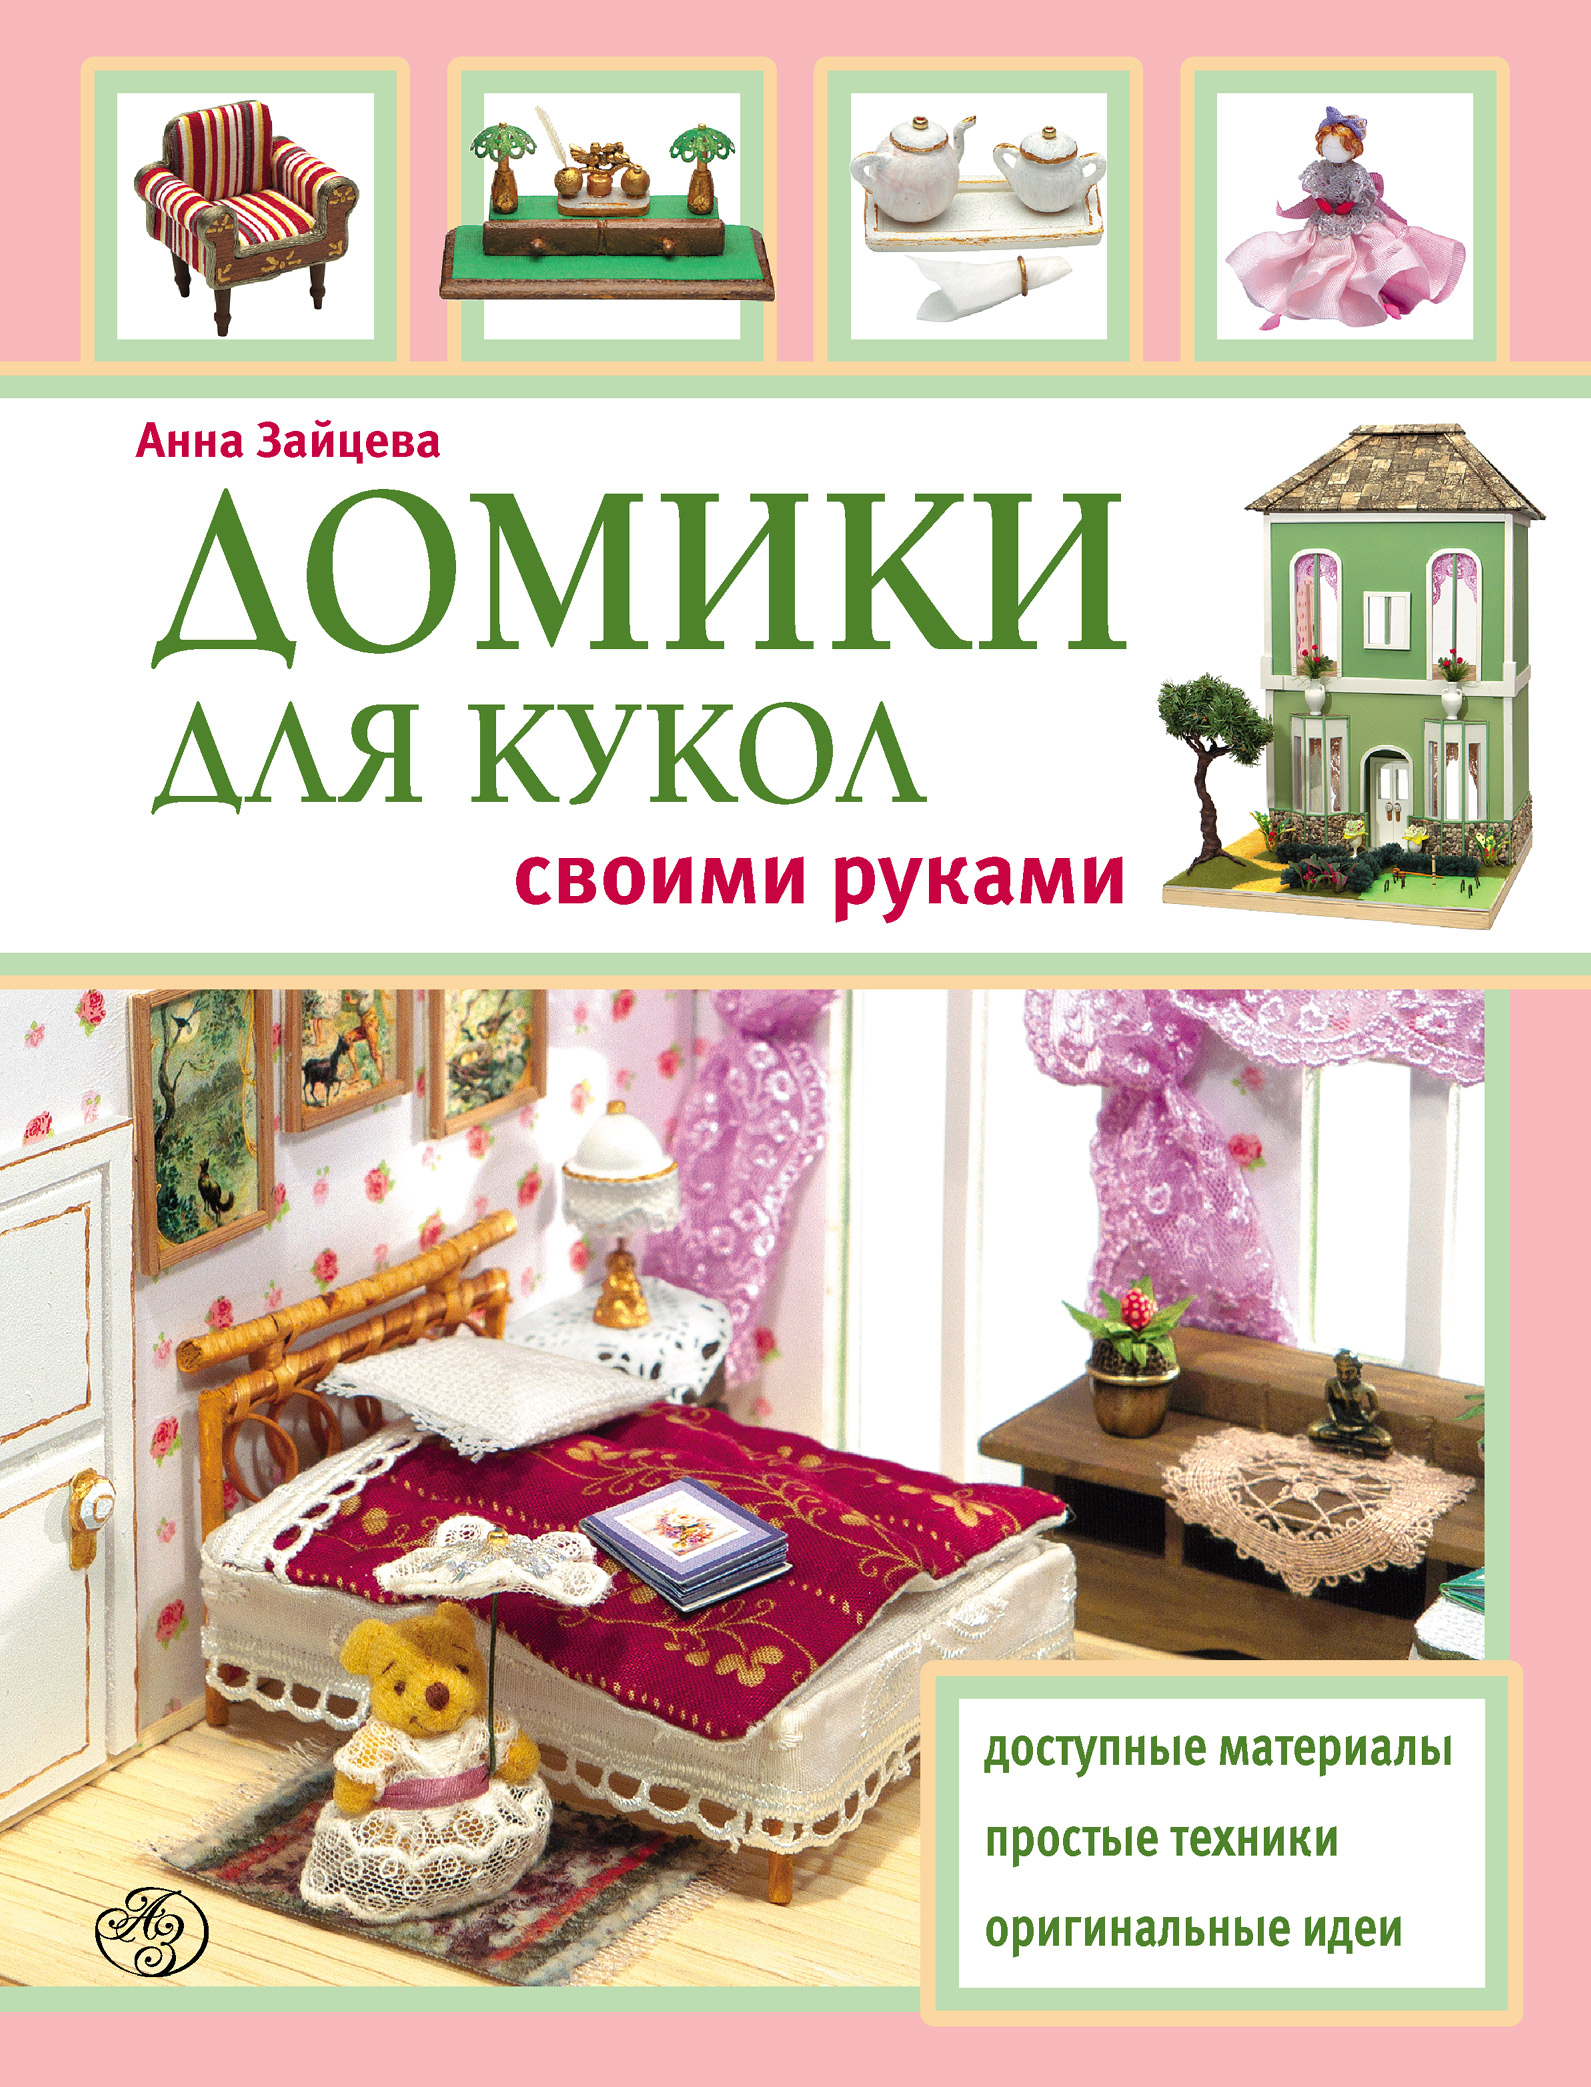 Анна Зайцева Домики для кукол своими руками эксмо домики для кукол своими руками